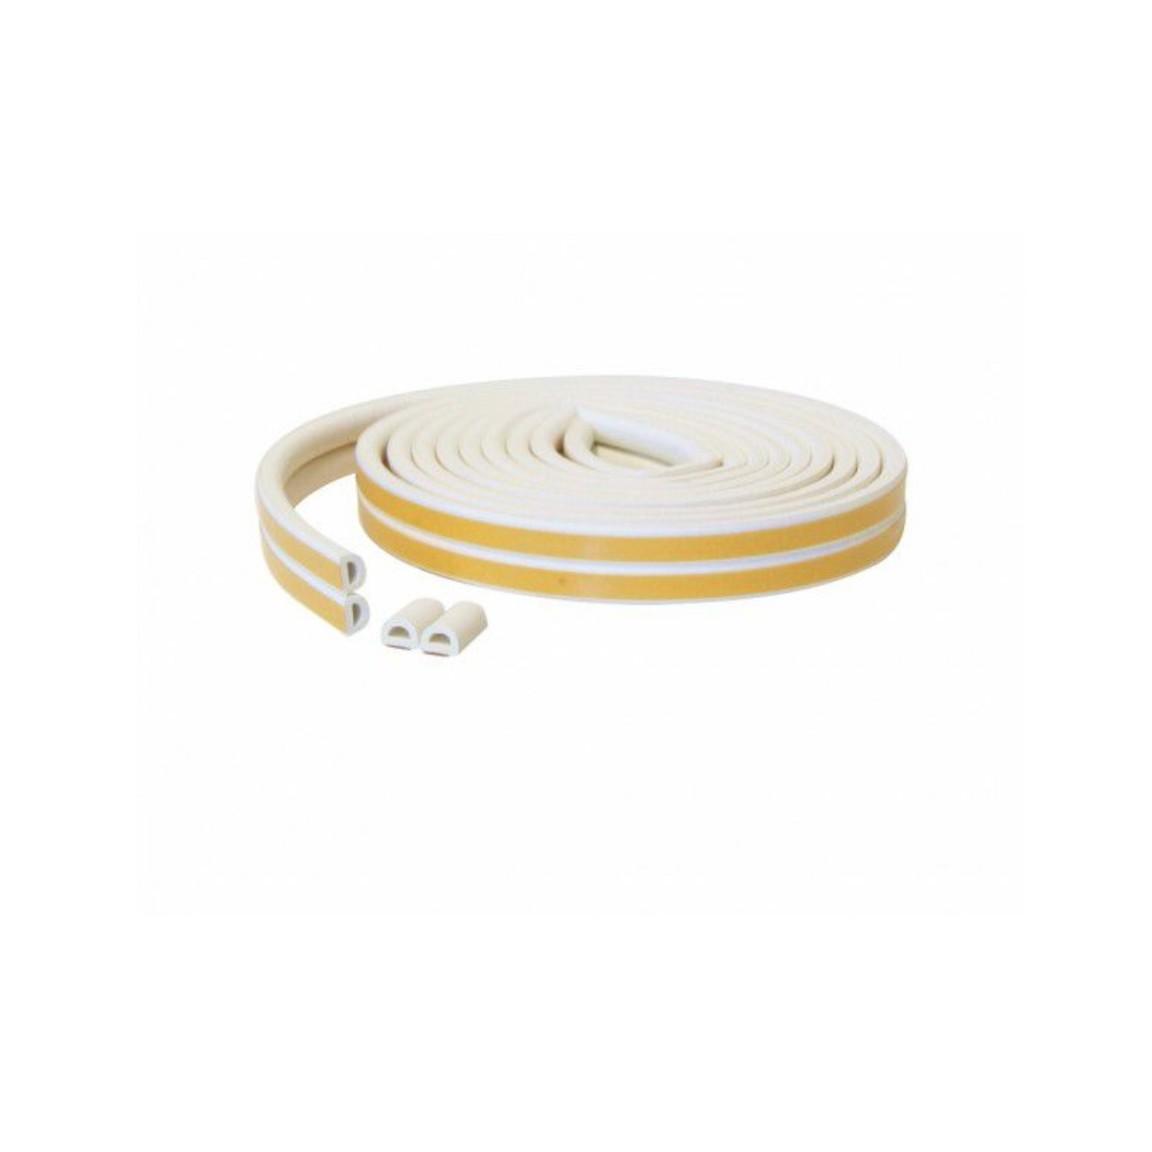 Veda Fresta Adesivo De Borracha 60 cm Branco 5001 - Stamaco